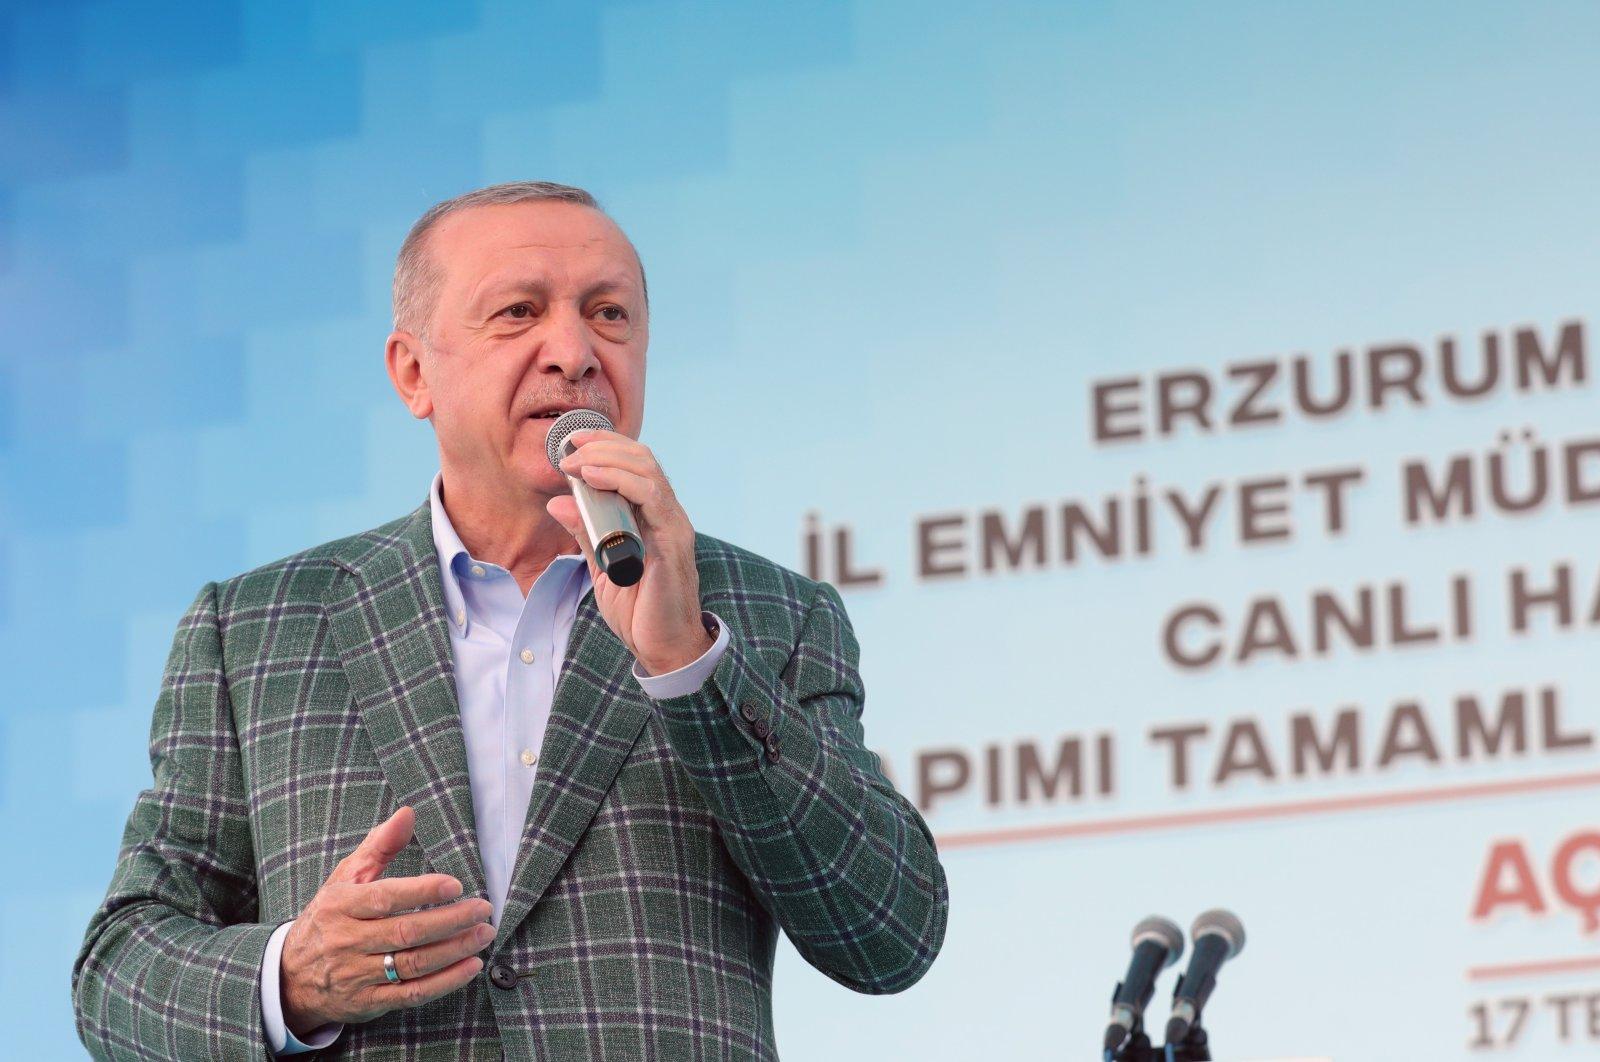 President Recep Tayyip Erdoğan speaks during a ceremony in Erzurum, eastern Turkey, July 17, 2021. (AA Photo)